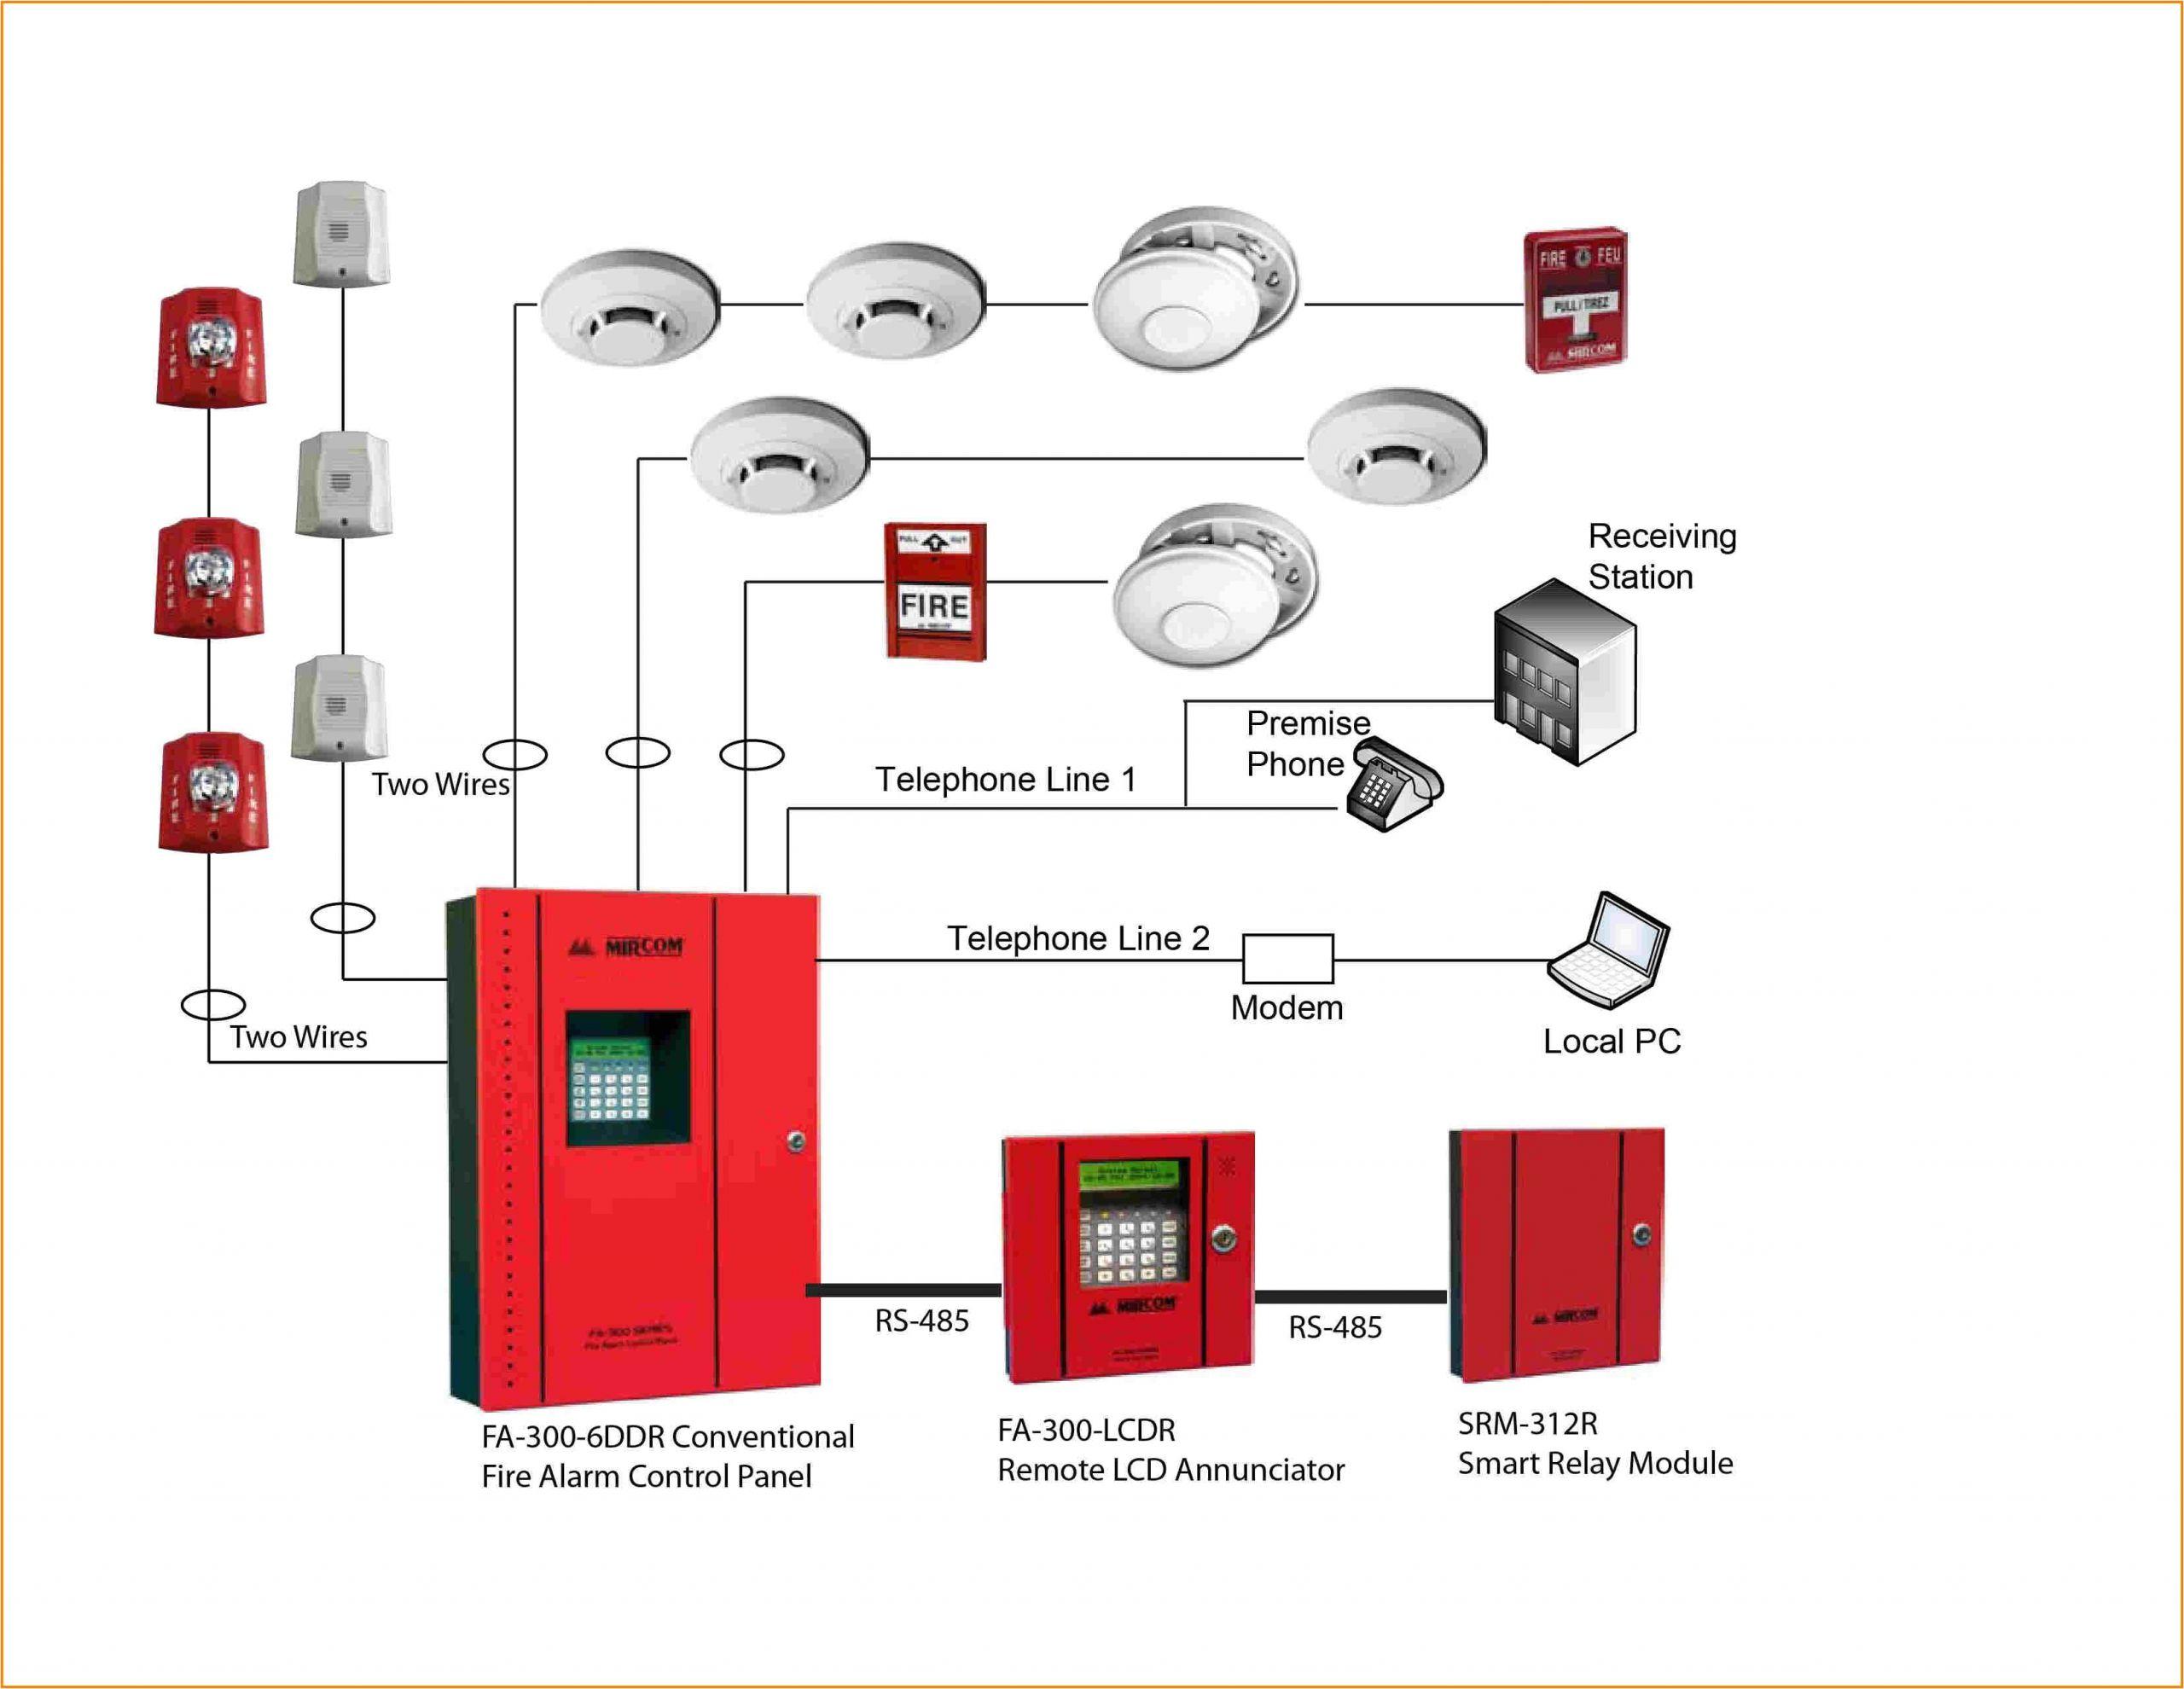 fire alarm addressable system wiring diagram pdf new system sensor smoke detector wiring diagram simple system sensor of fire alarm addressable system wiring diagram pdf png jpg